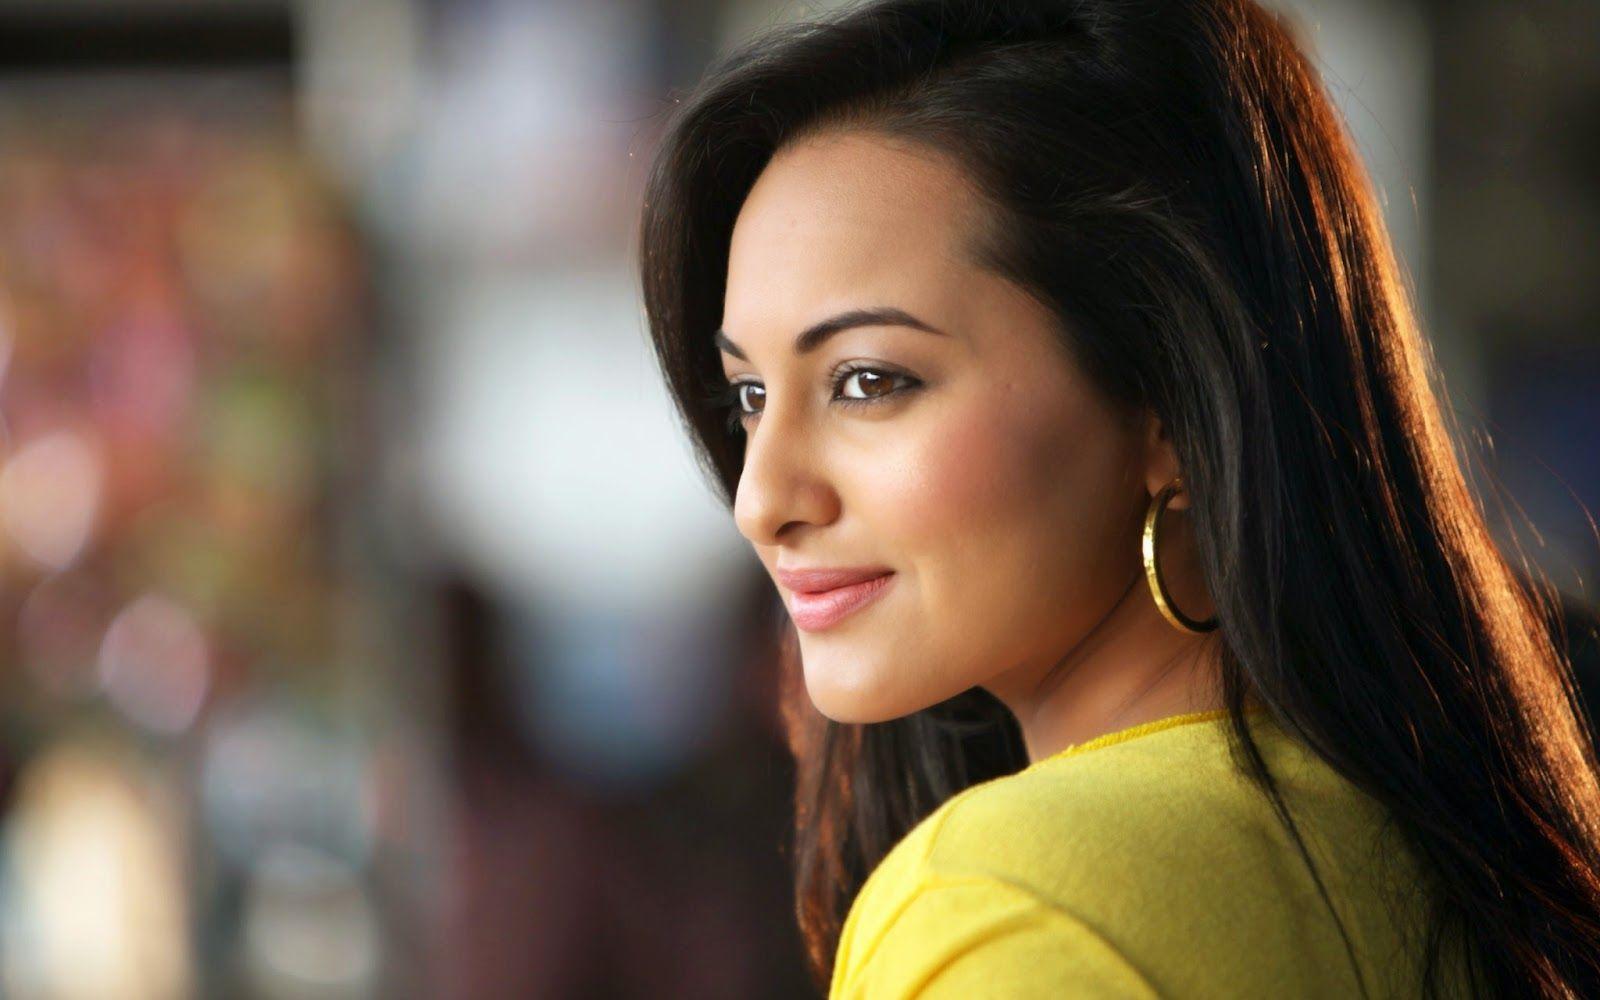 Bollywood Actress Wallpaper Hd 2015 Wallpapersafari